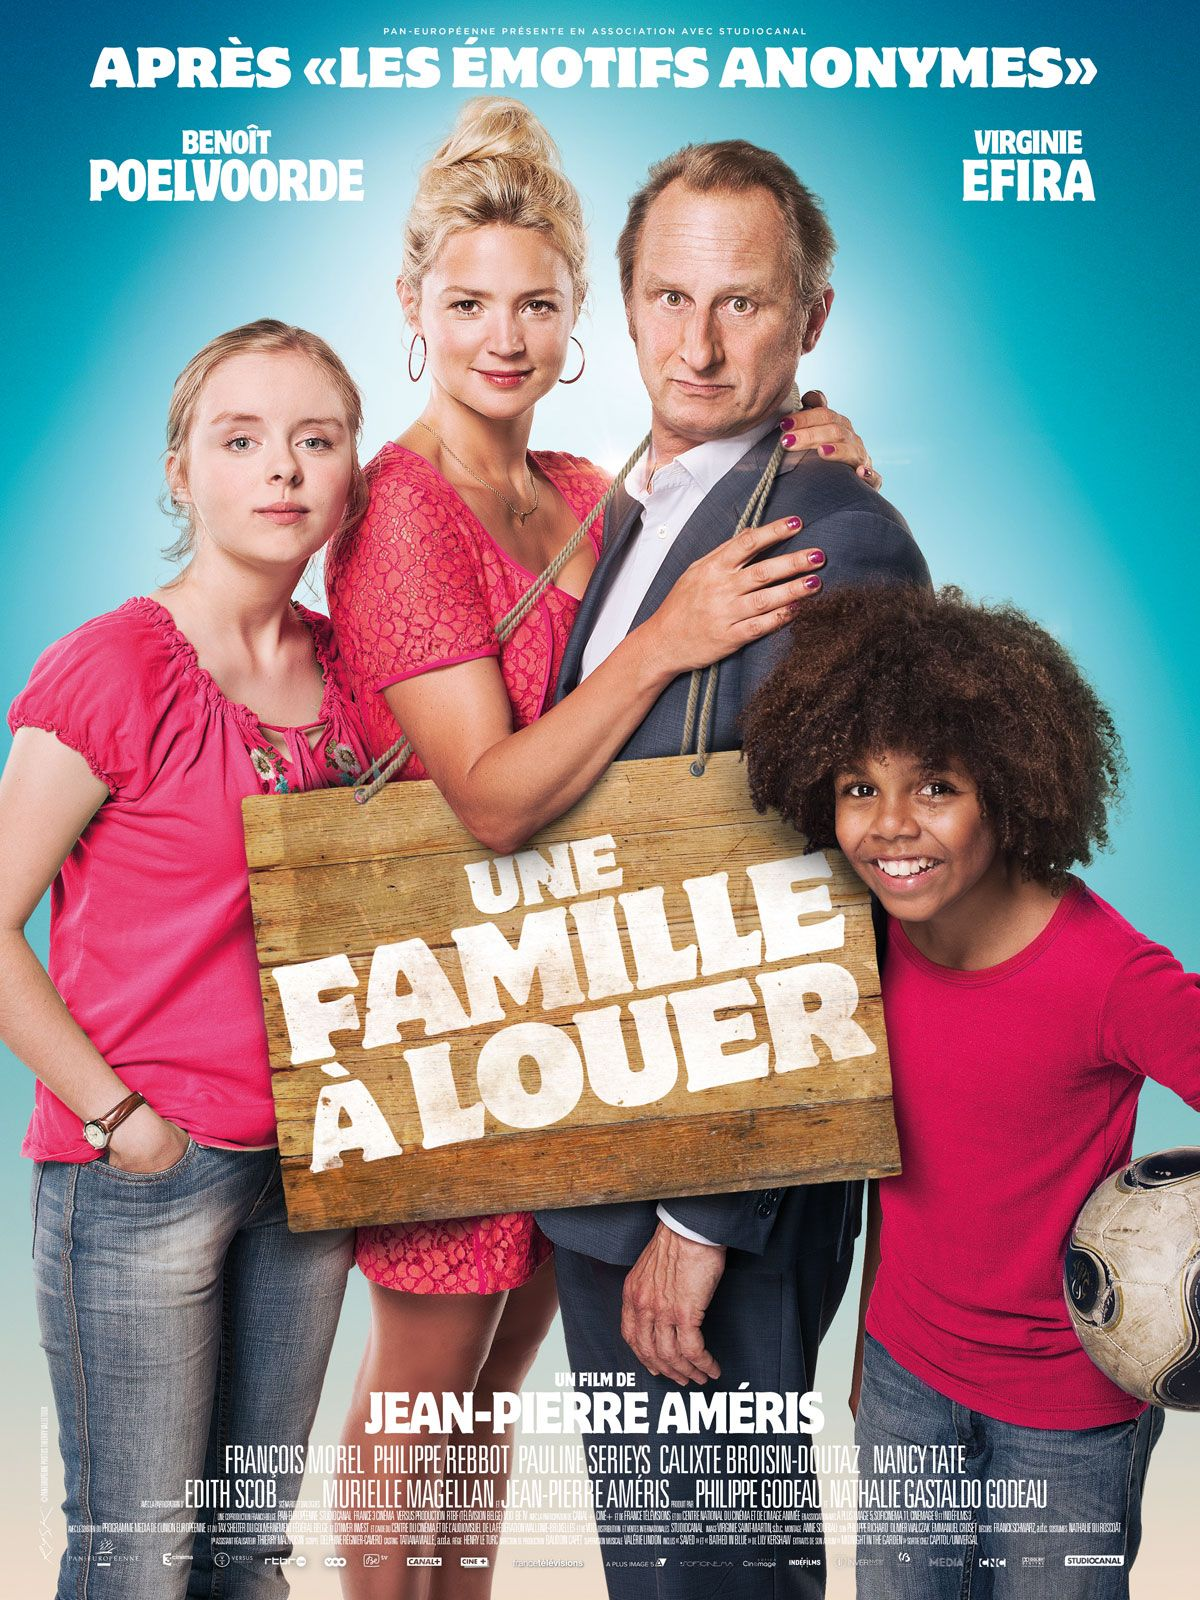 une famille a louer films pinterest emociones pel culas y francia. Black Bedroom Furniture Sets. Home Design Ideas